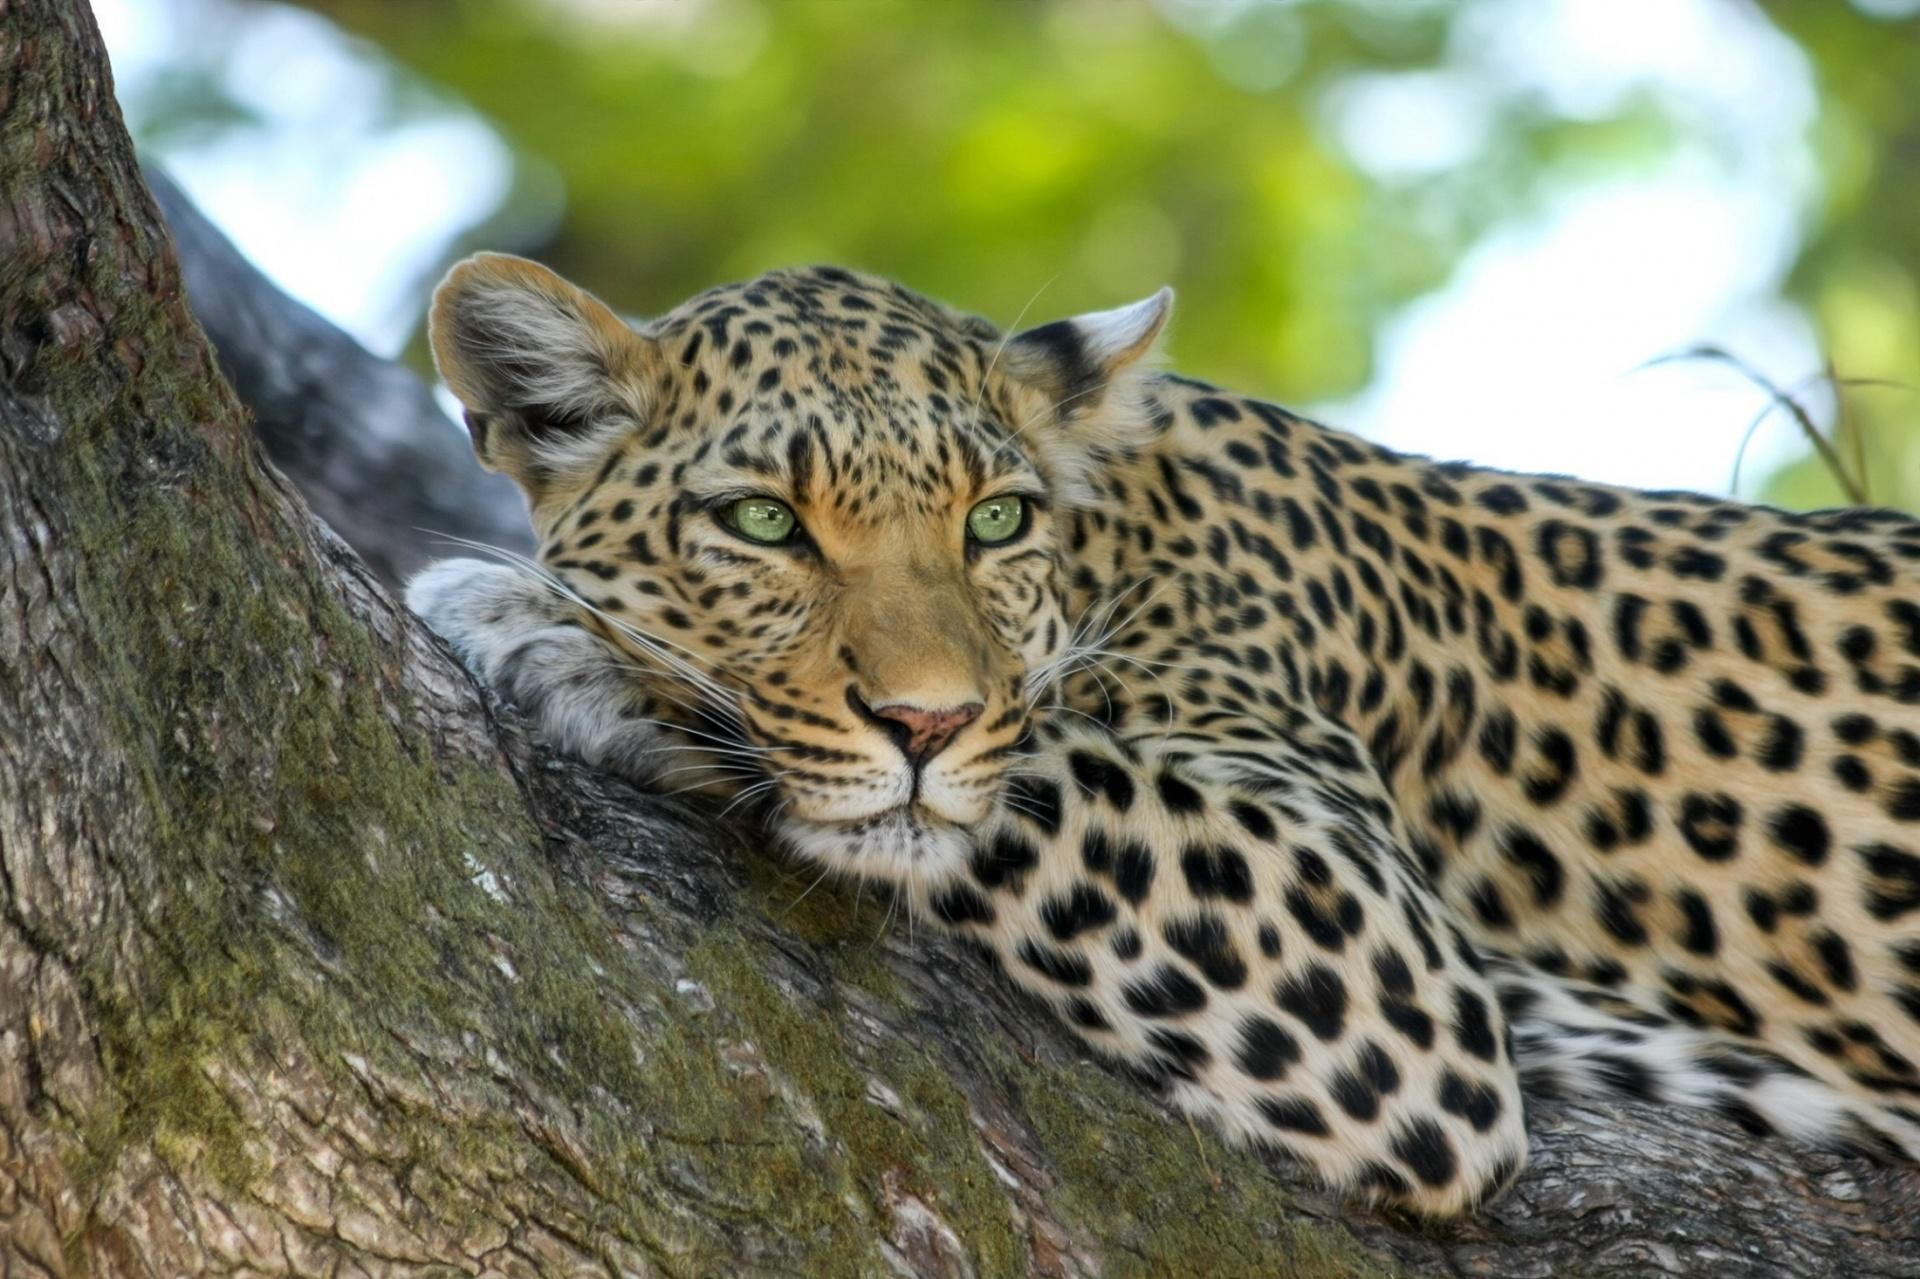 Leopard,big cat,feline,portrait,wildlife - free image from needpix.com